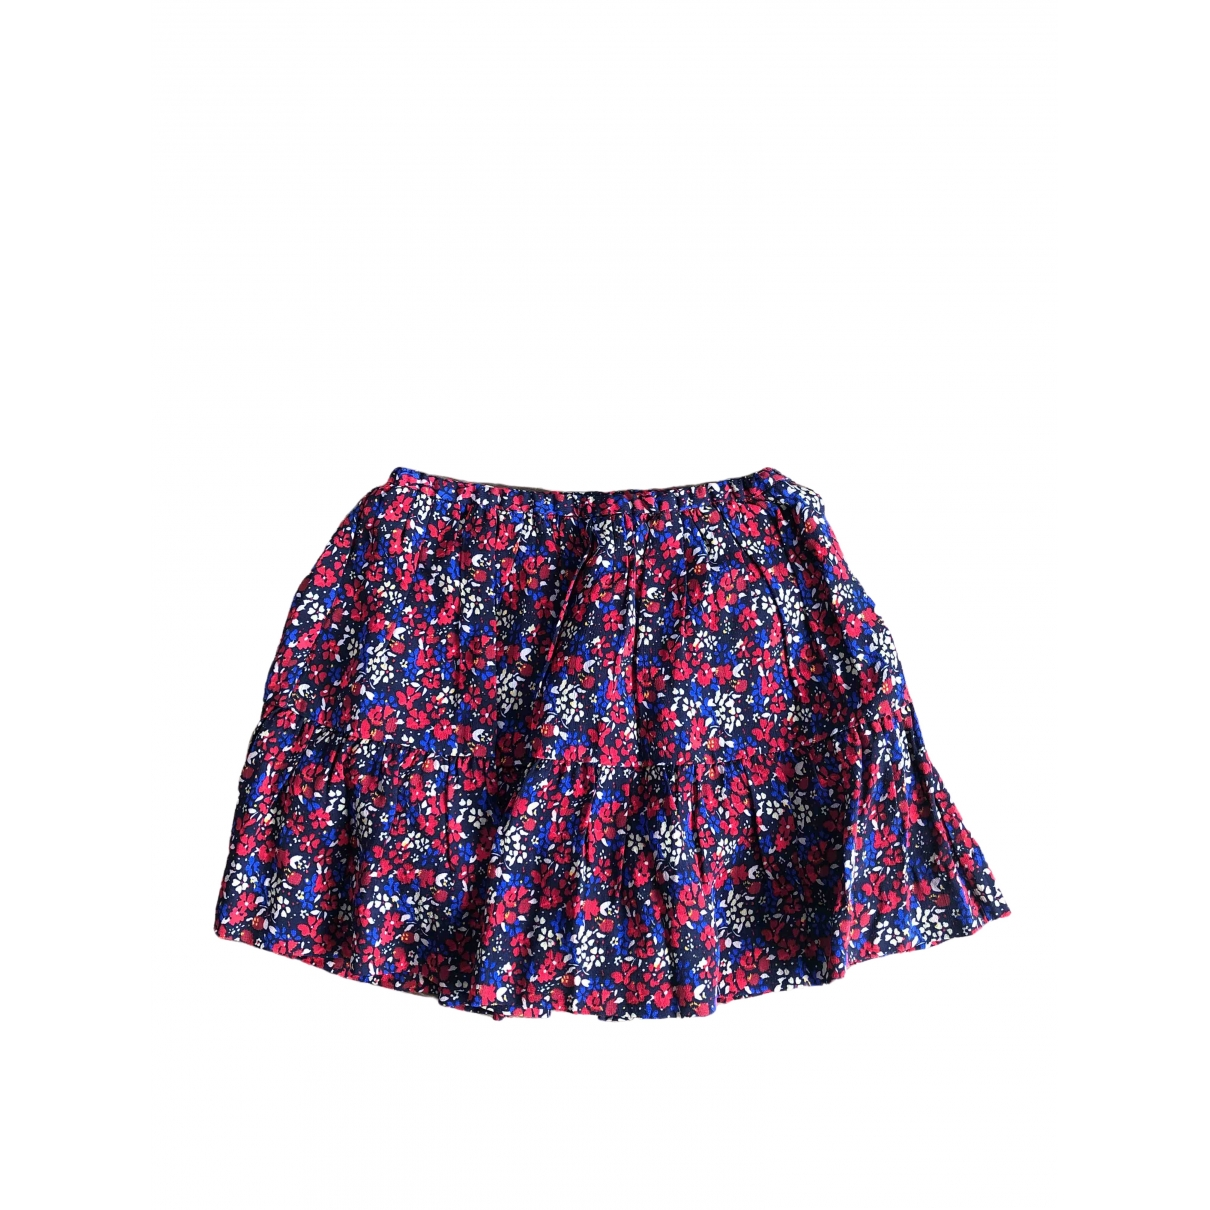 Bonpoint \N Multicolour skirt for Kids 10 years - up to 142cm FR